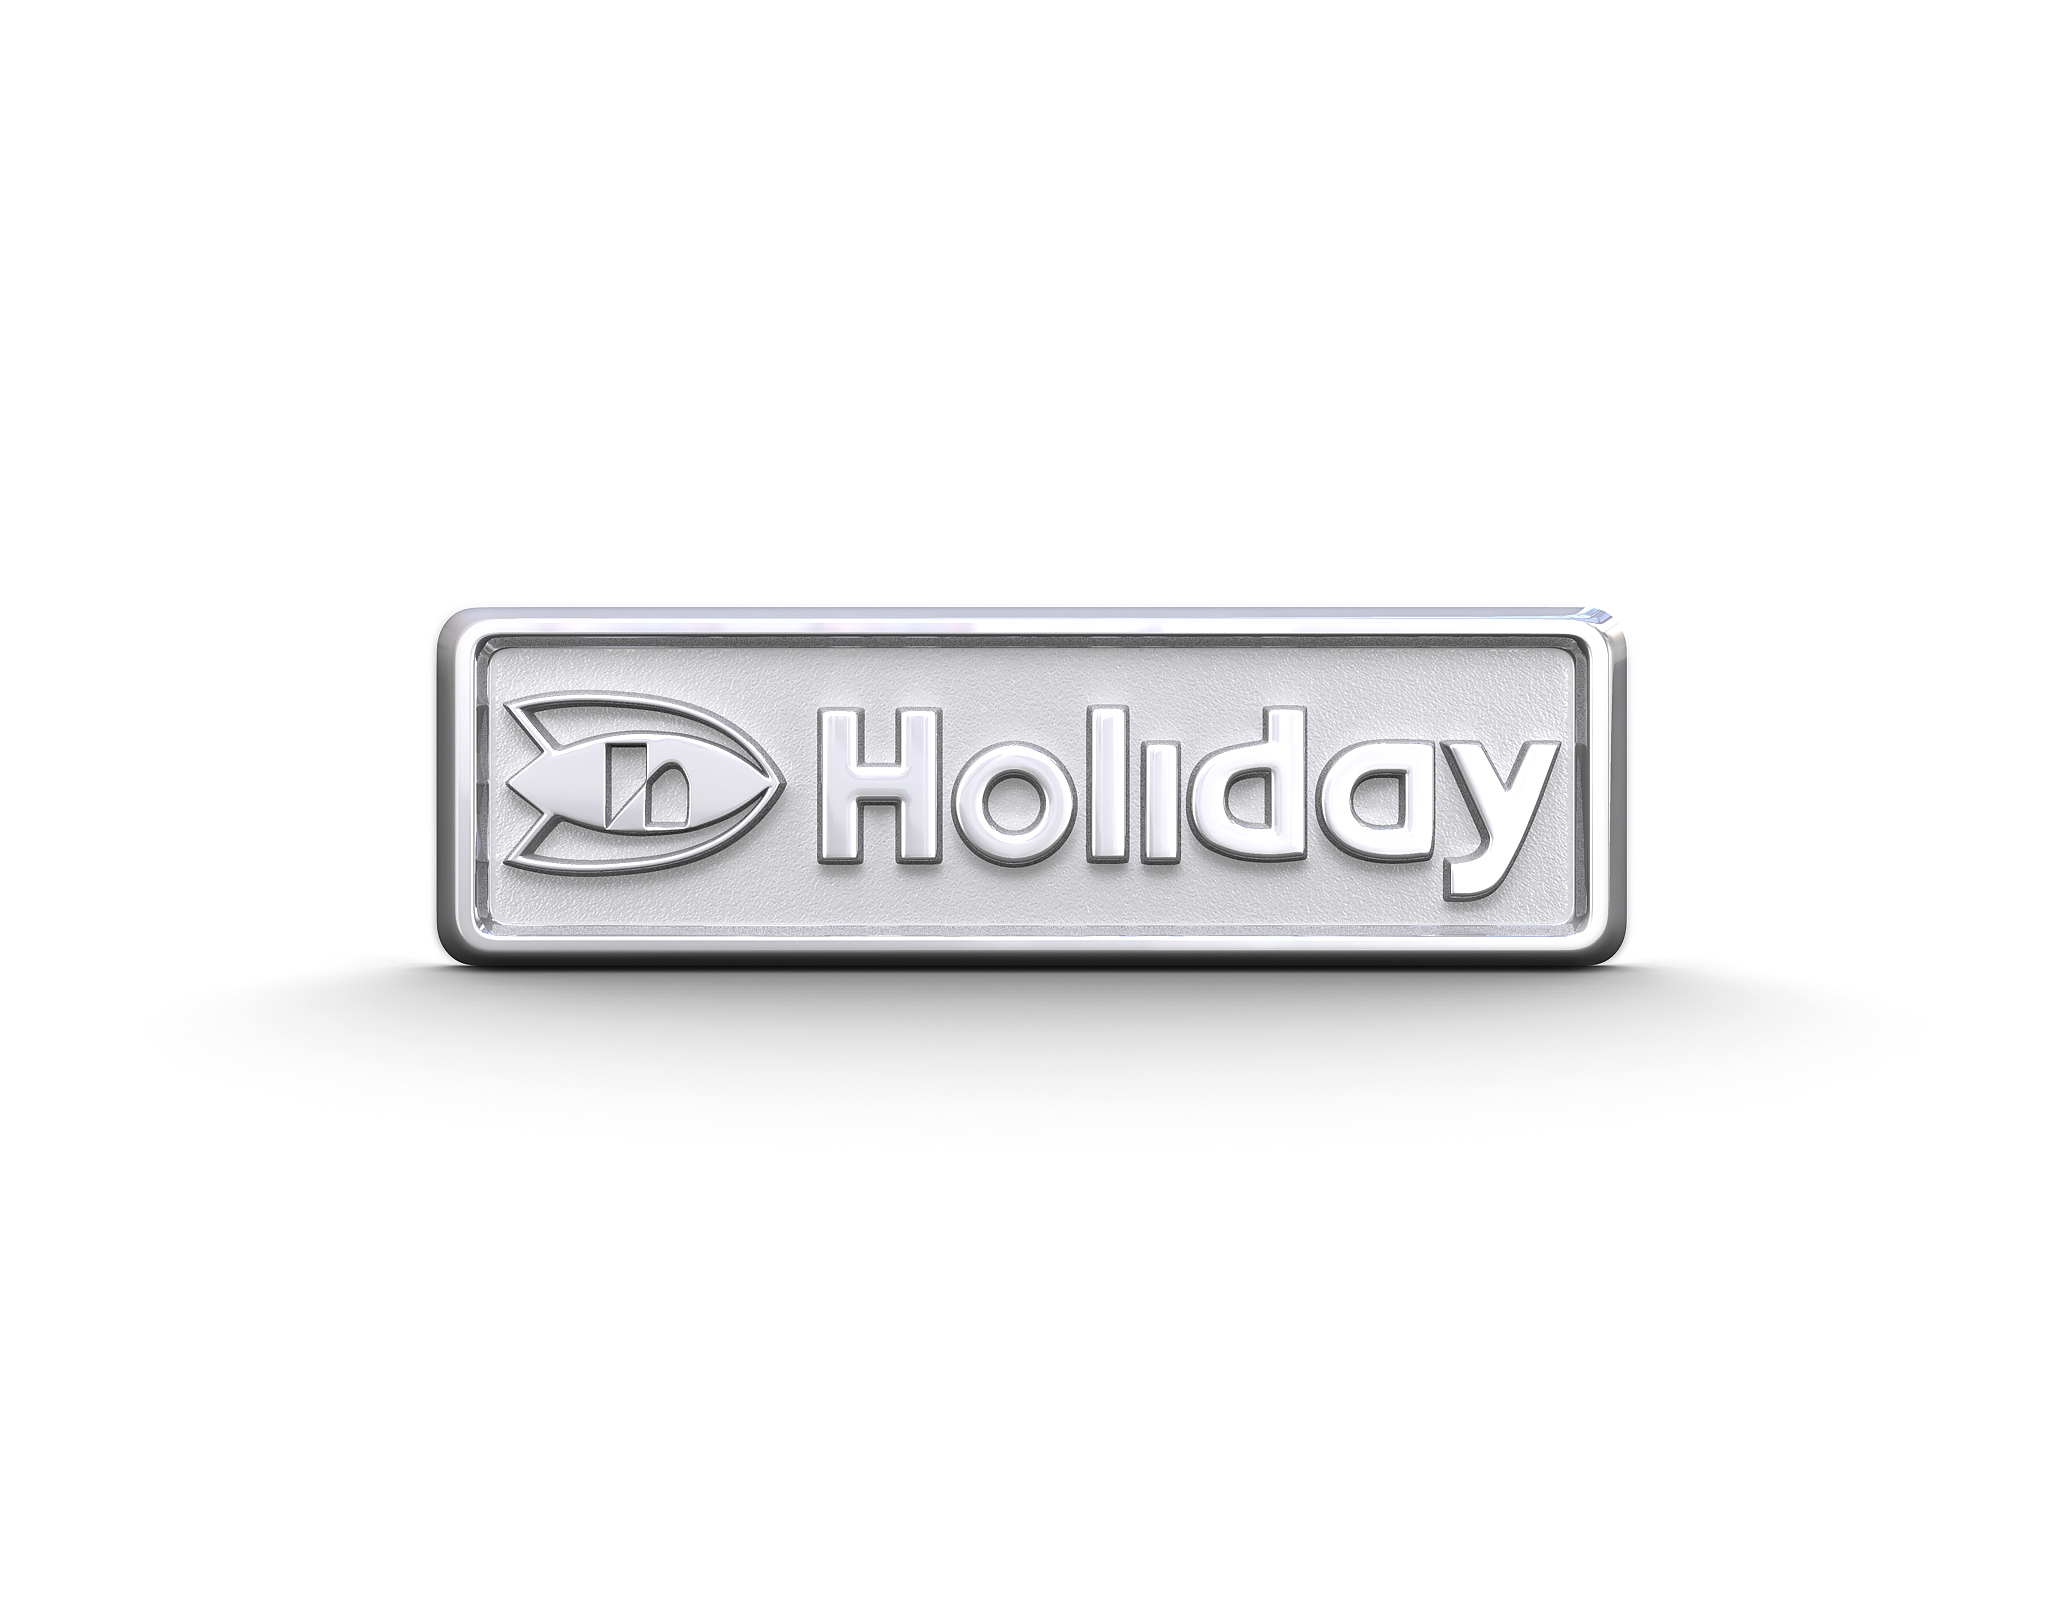 Holiday_White.jpg